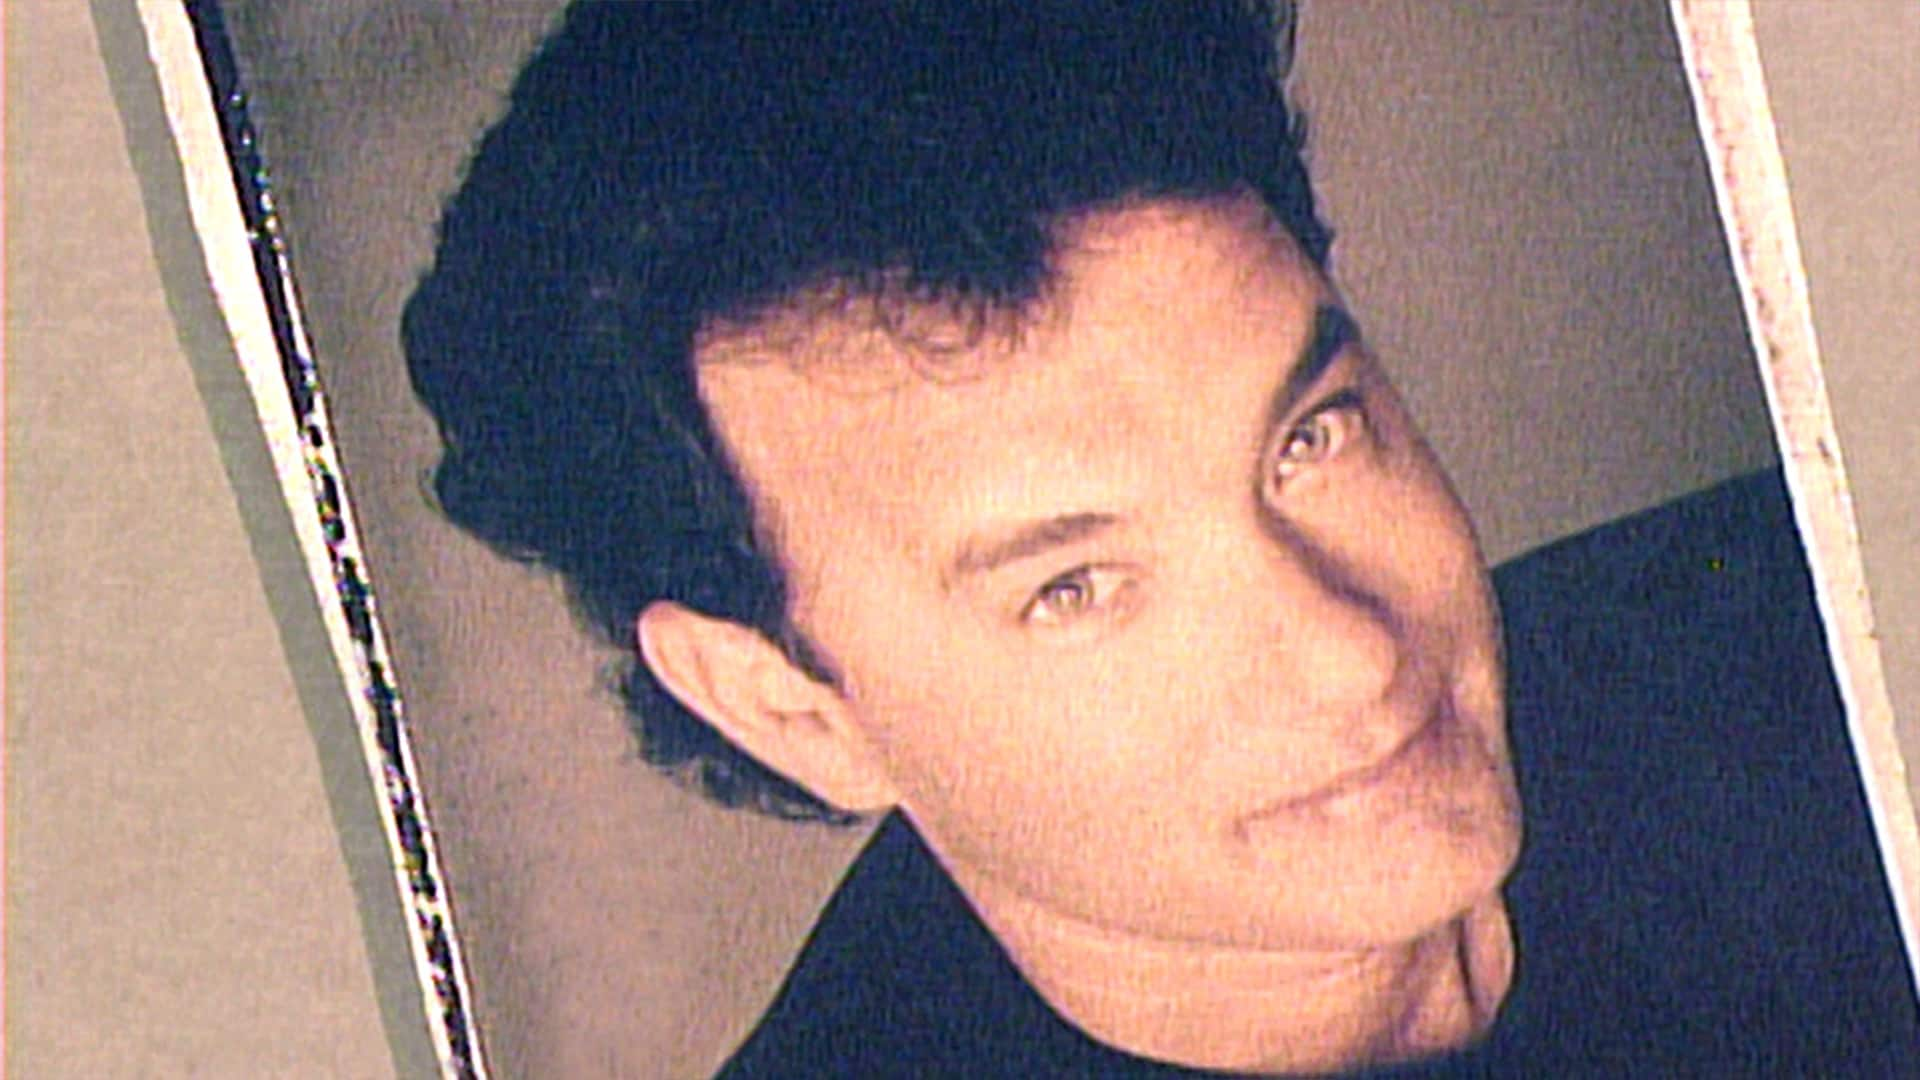 Tom Hanks: May 9, 1992